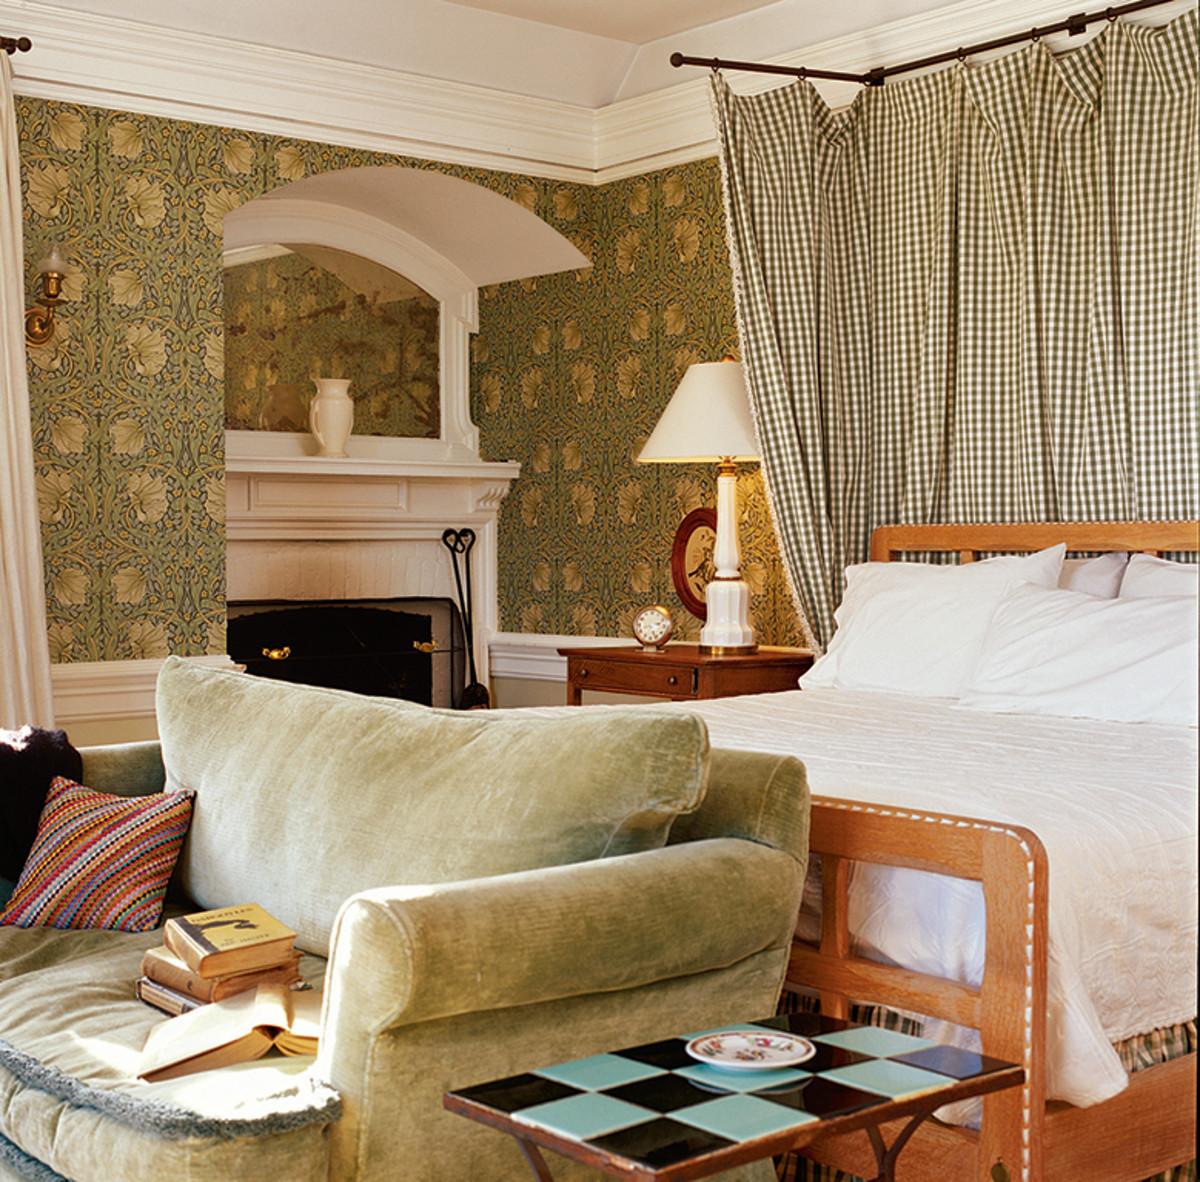 The Arts Amp Crafts Bedroom Design For The Arts Amp Crafts